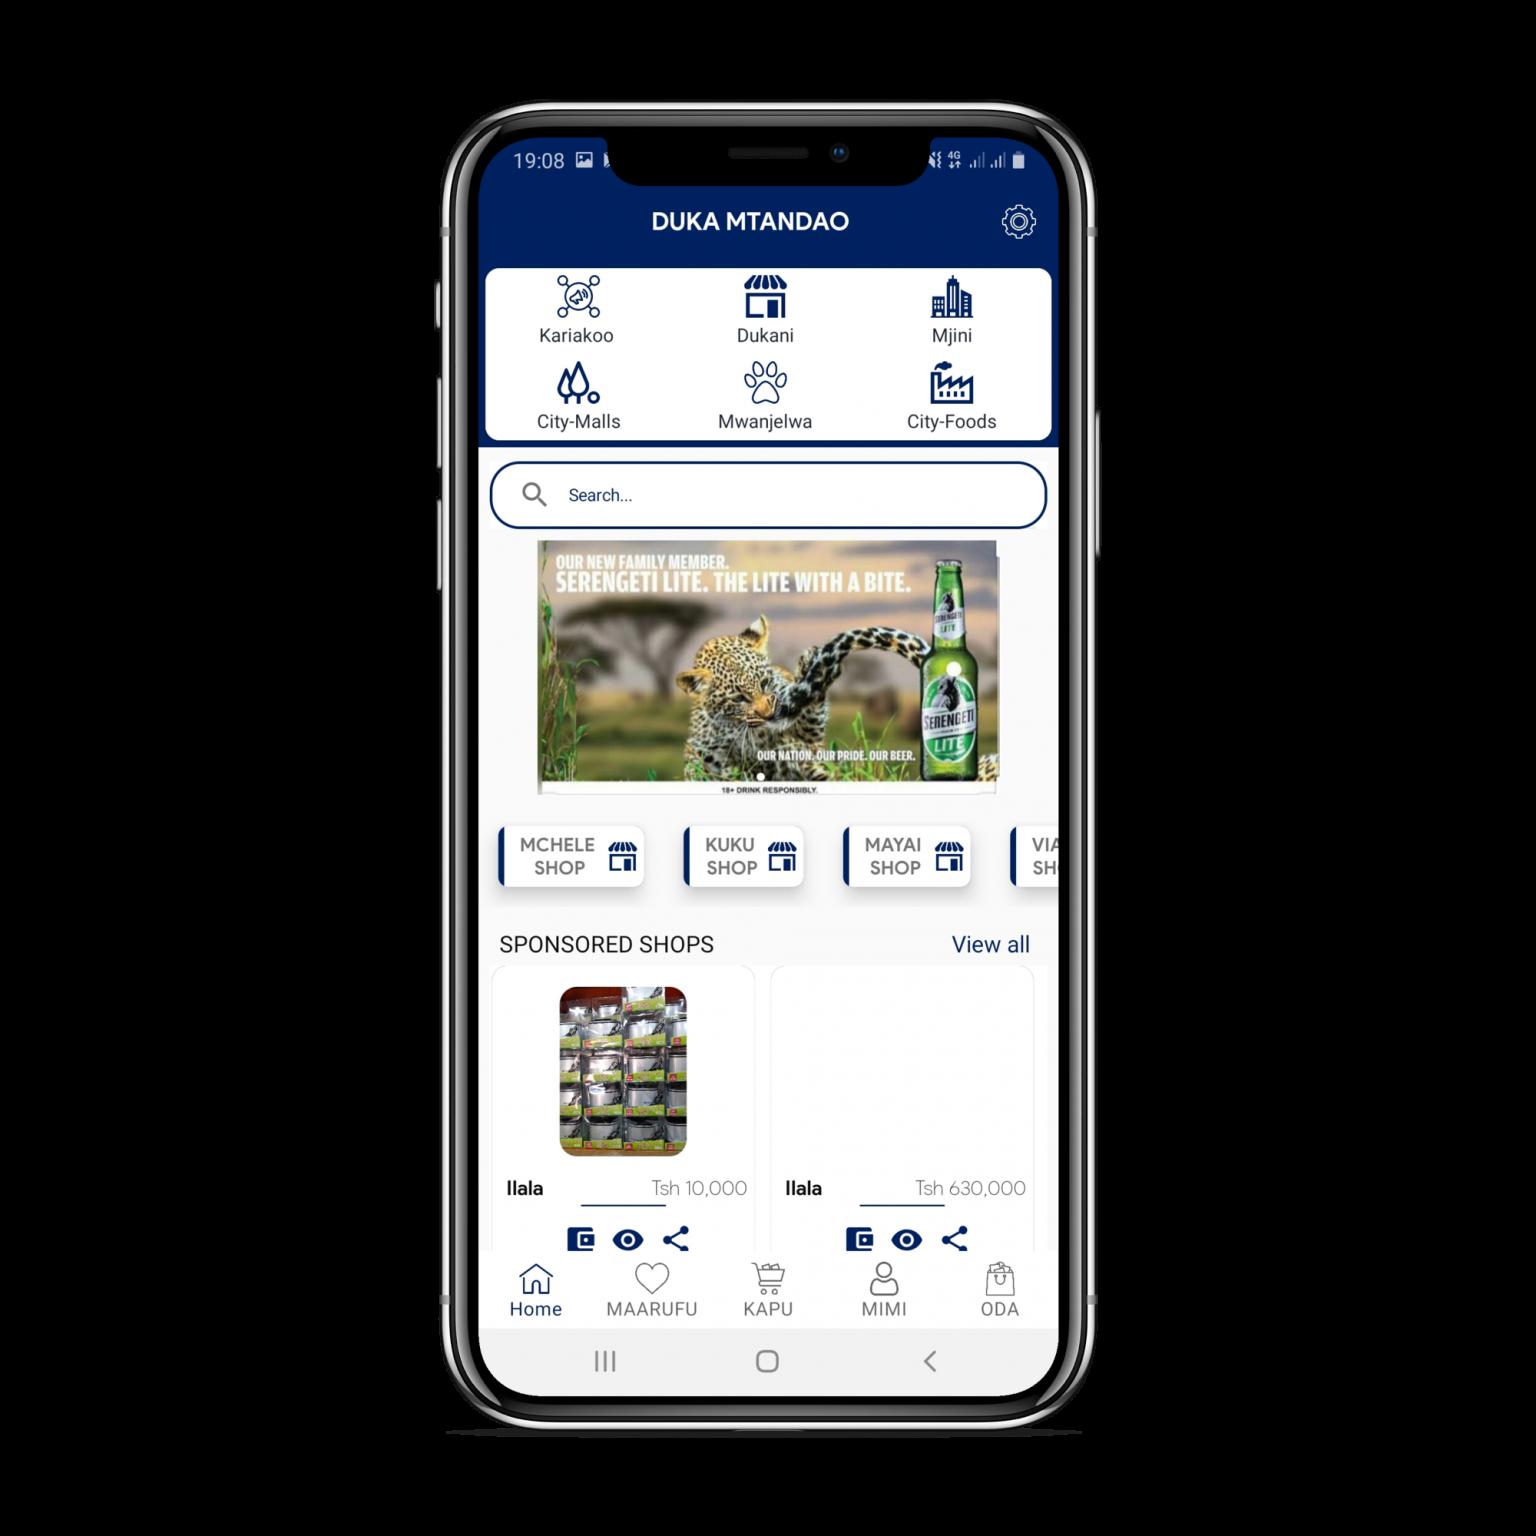 duka.com android app developed by Nougat technologies Tanzania,uza nunua ,online business africa